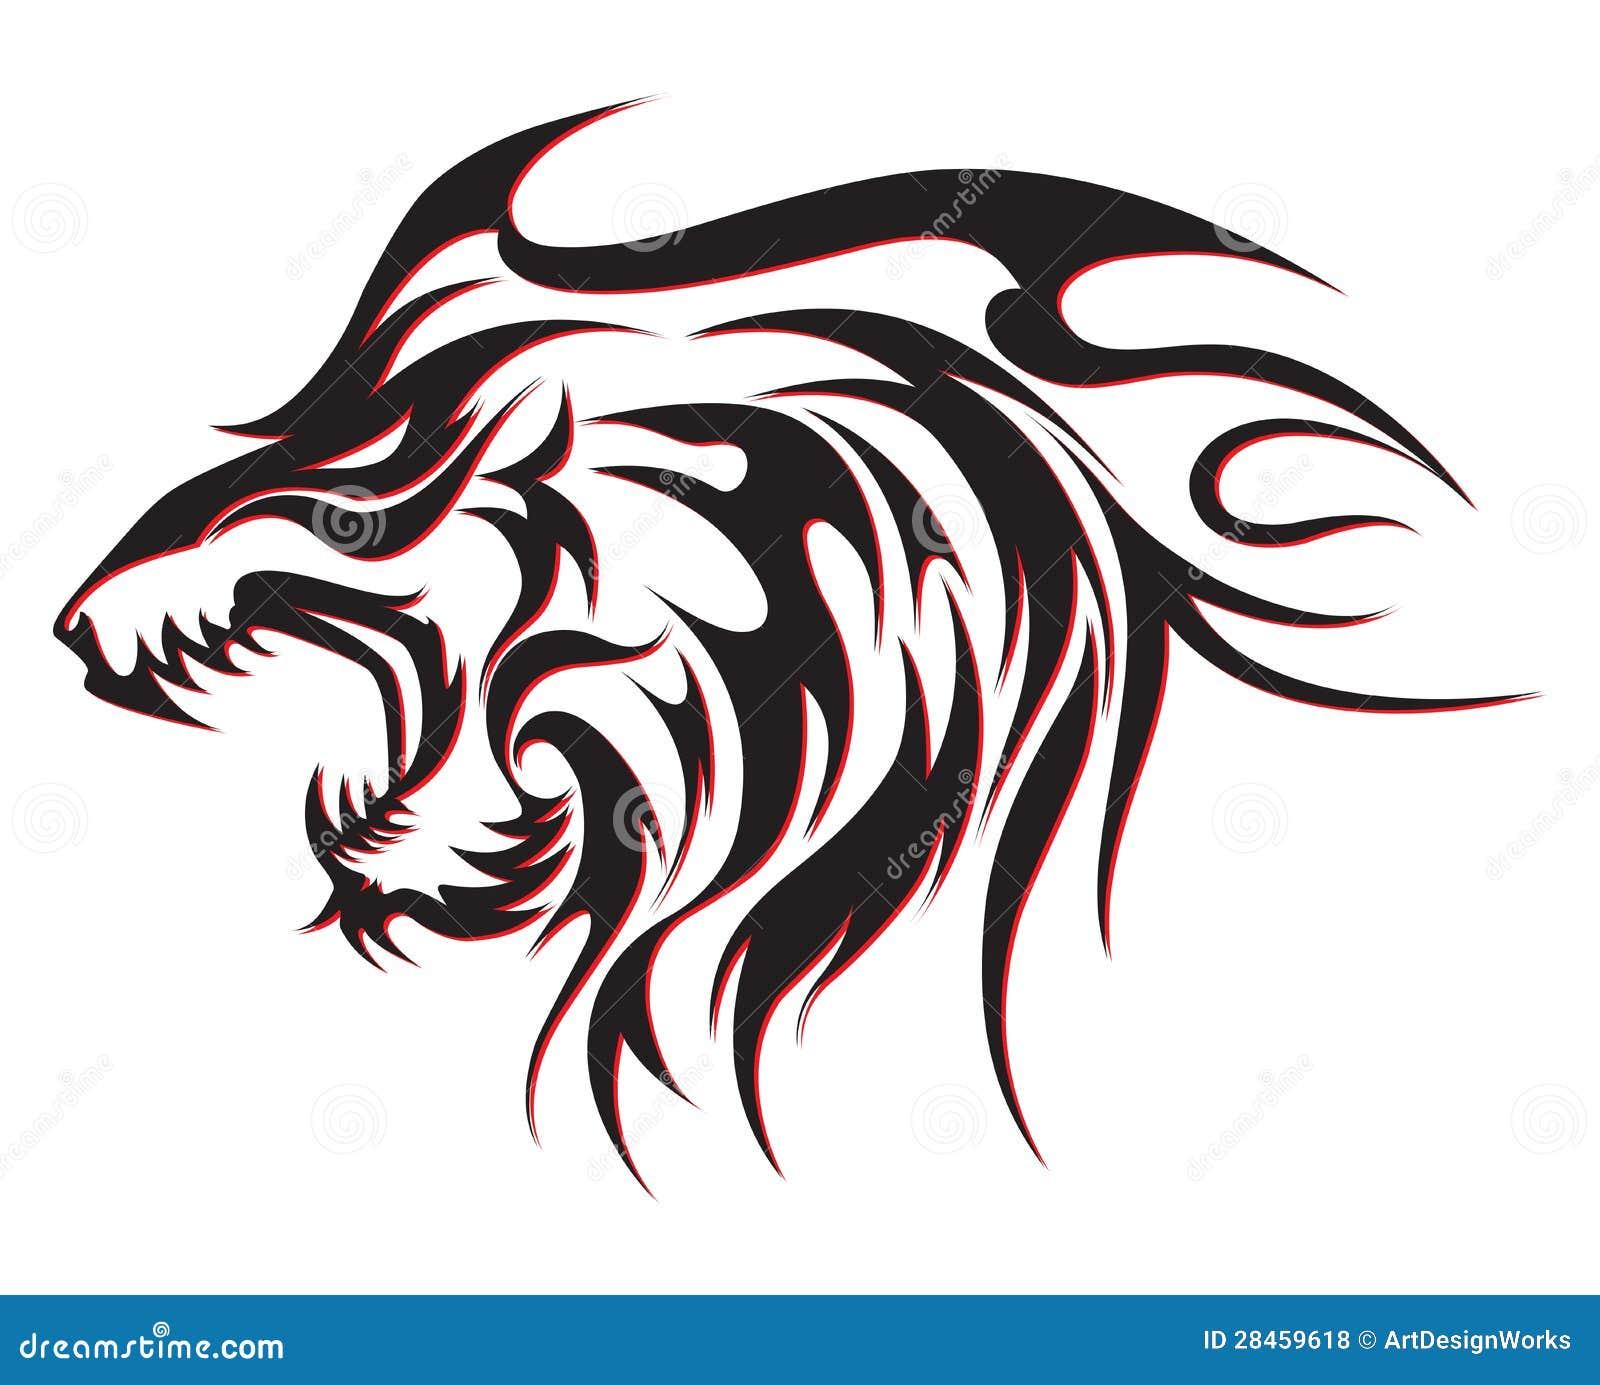 Tribalwolf tatuering